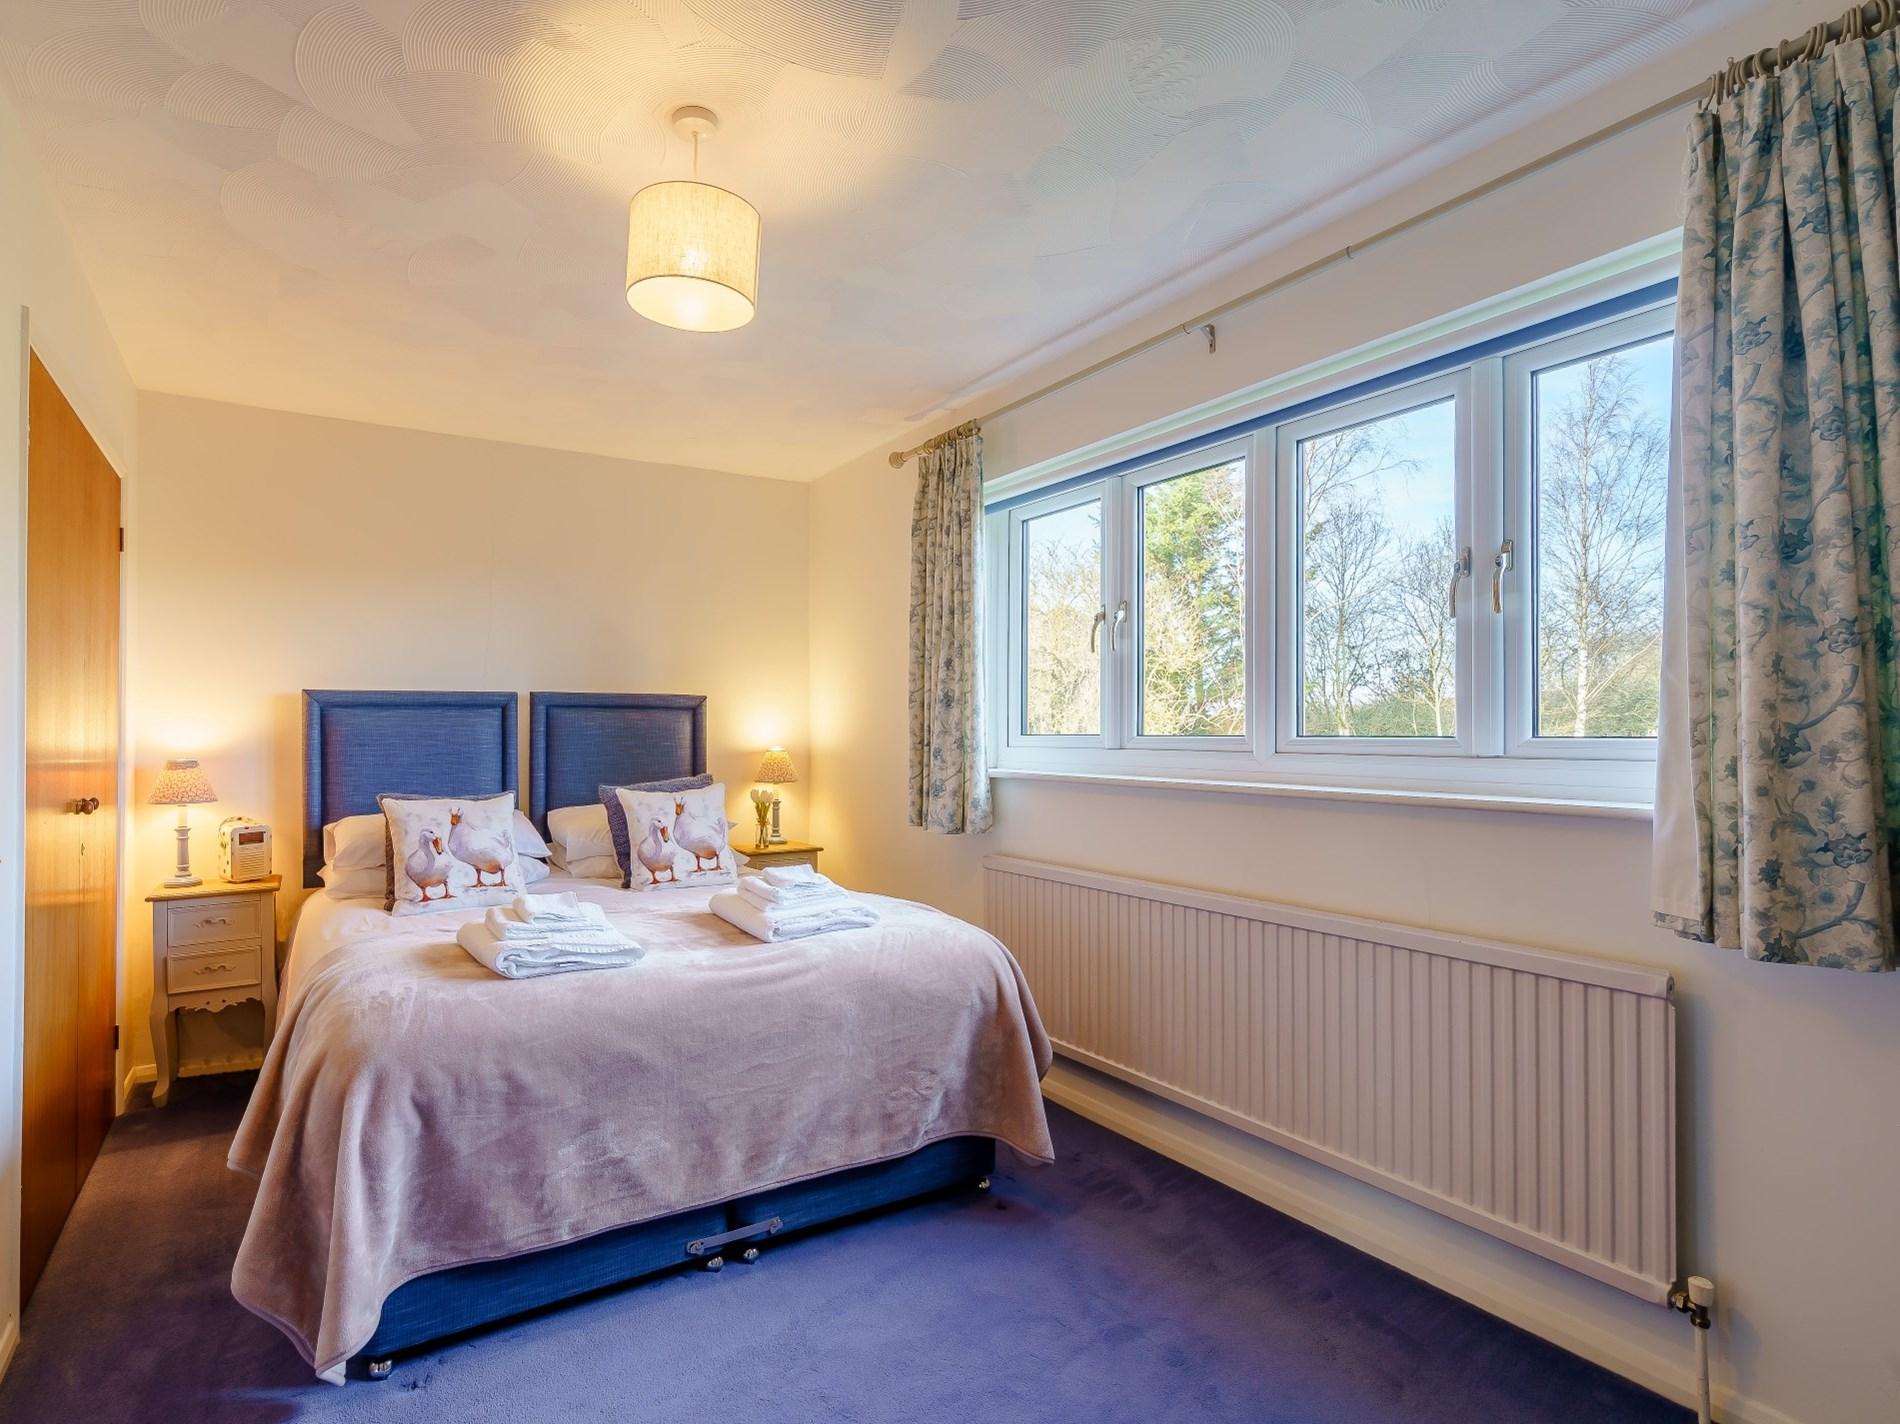 6 Bedroom Cottage in Aylesbury, Heart of England